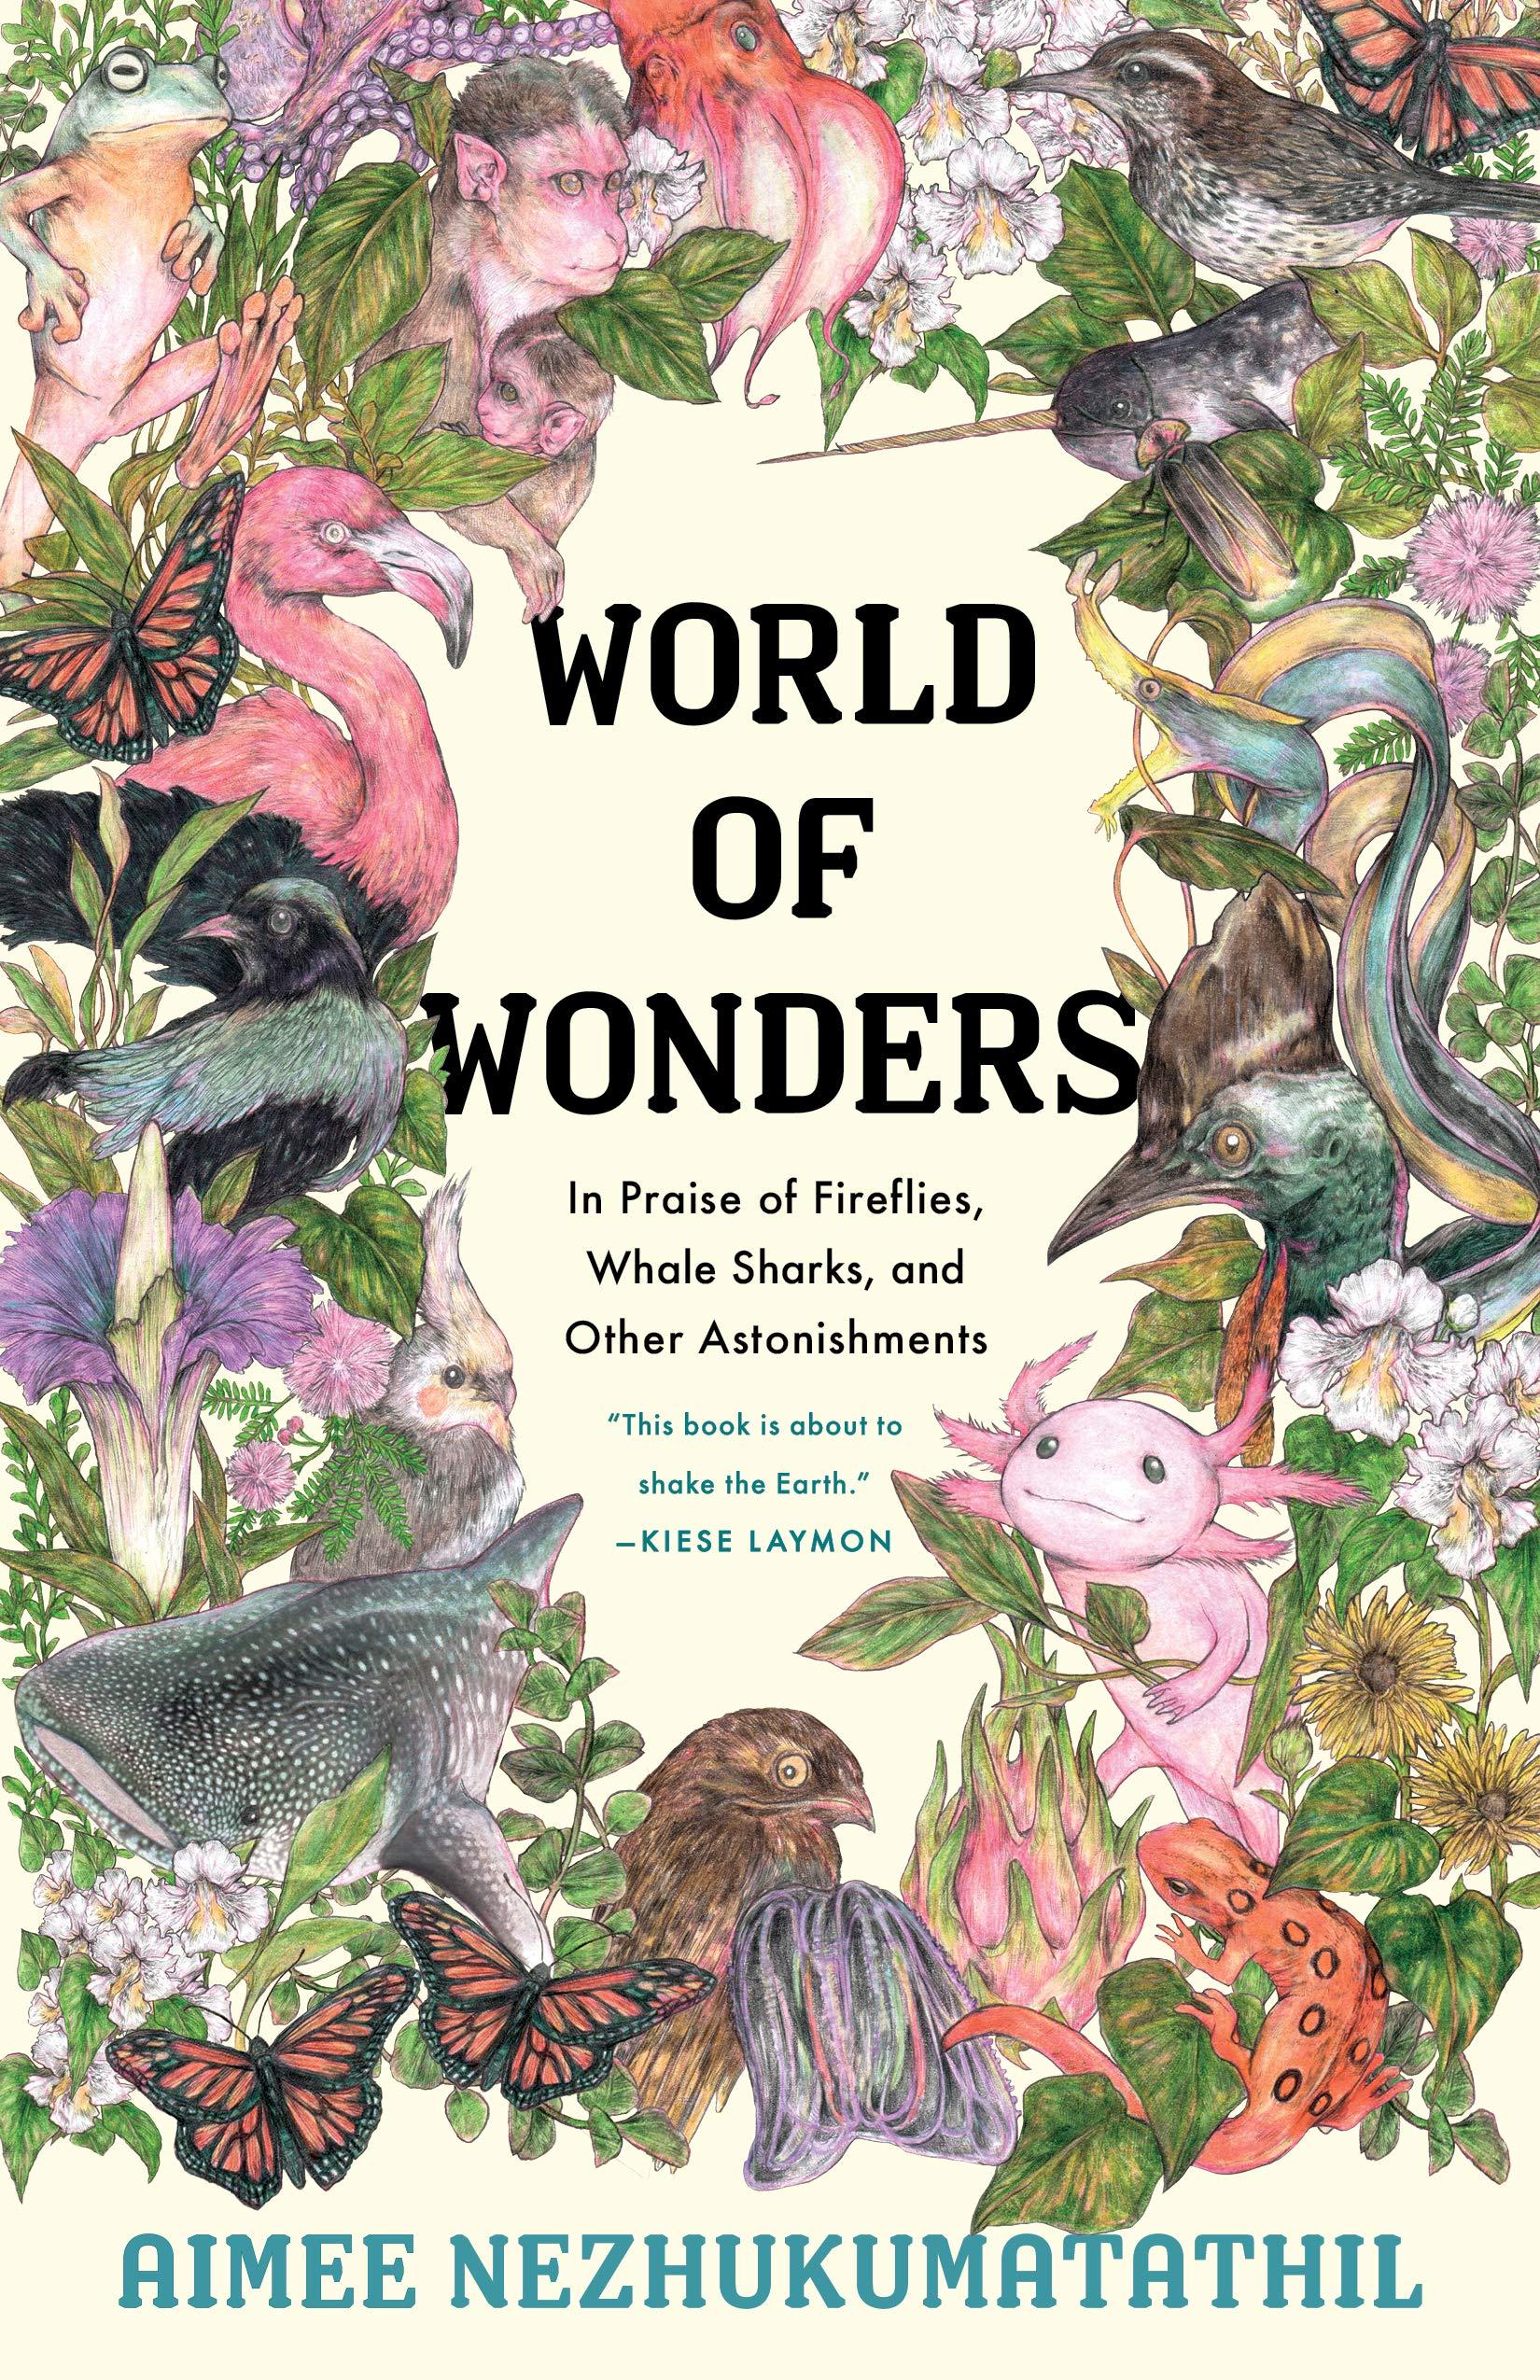 world of wonders by aimee nezhukumatathil | paradise found santa barbara